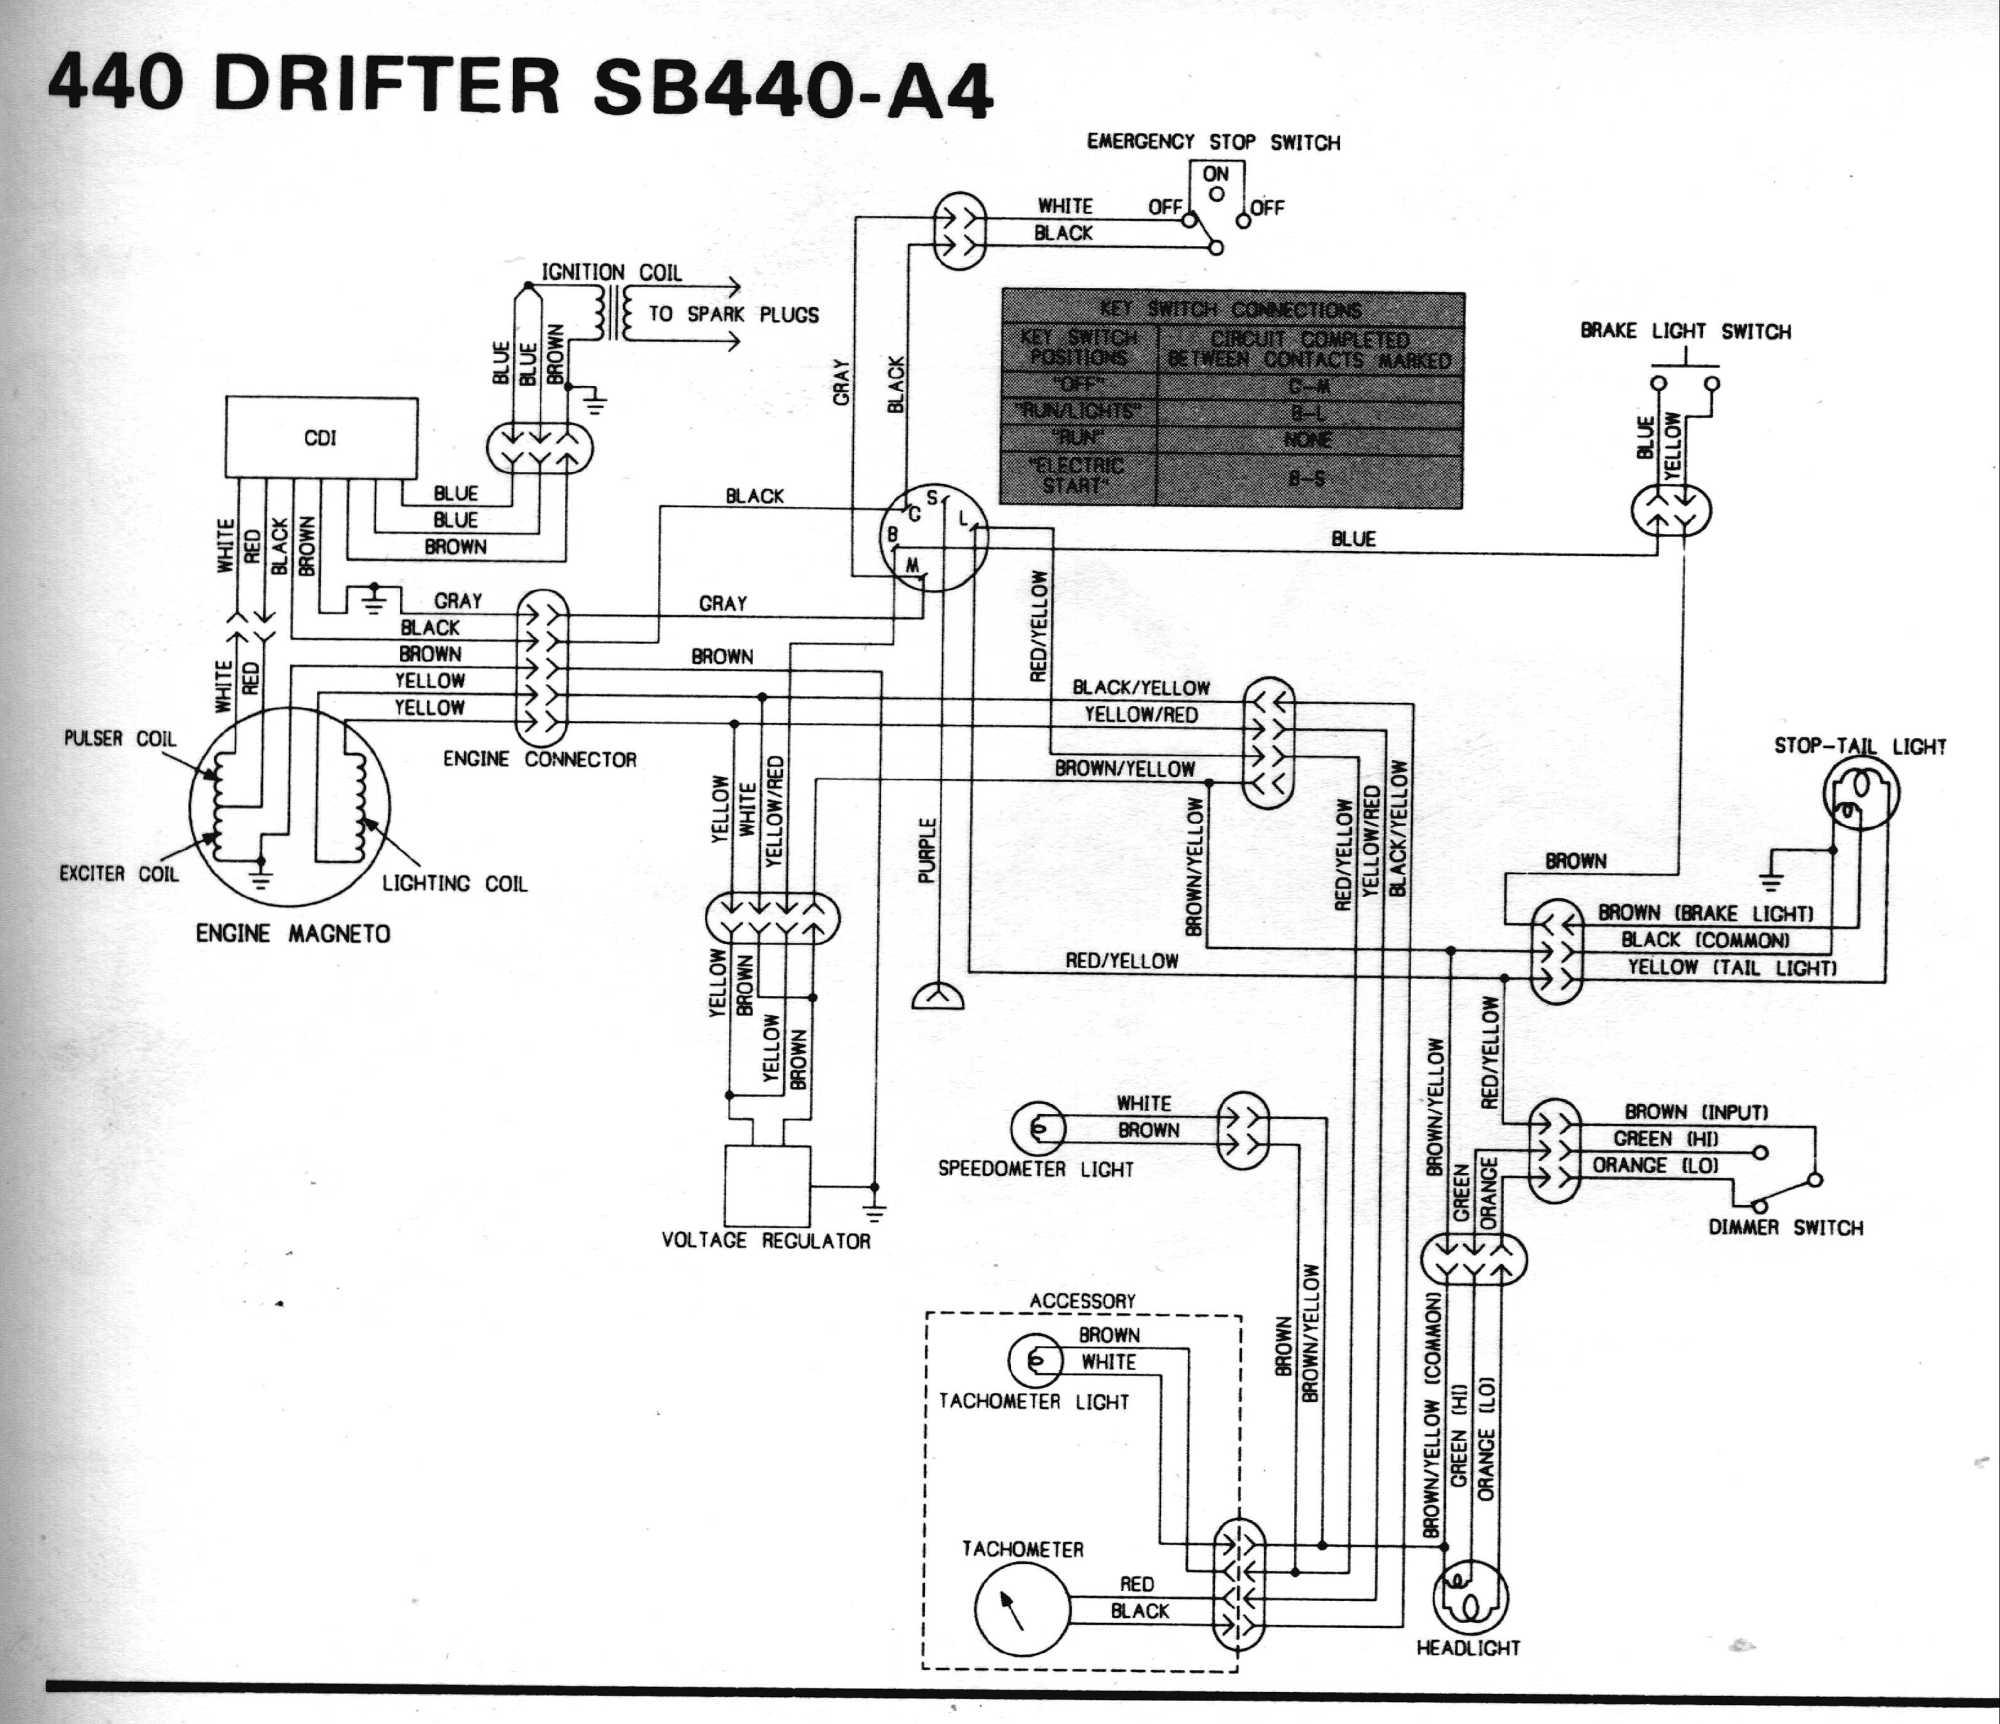 hight resolution of 1980 drifter 440 sb440 a4 kawasaki drifter wiring diagrams